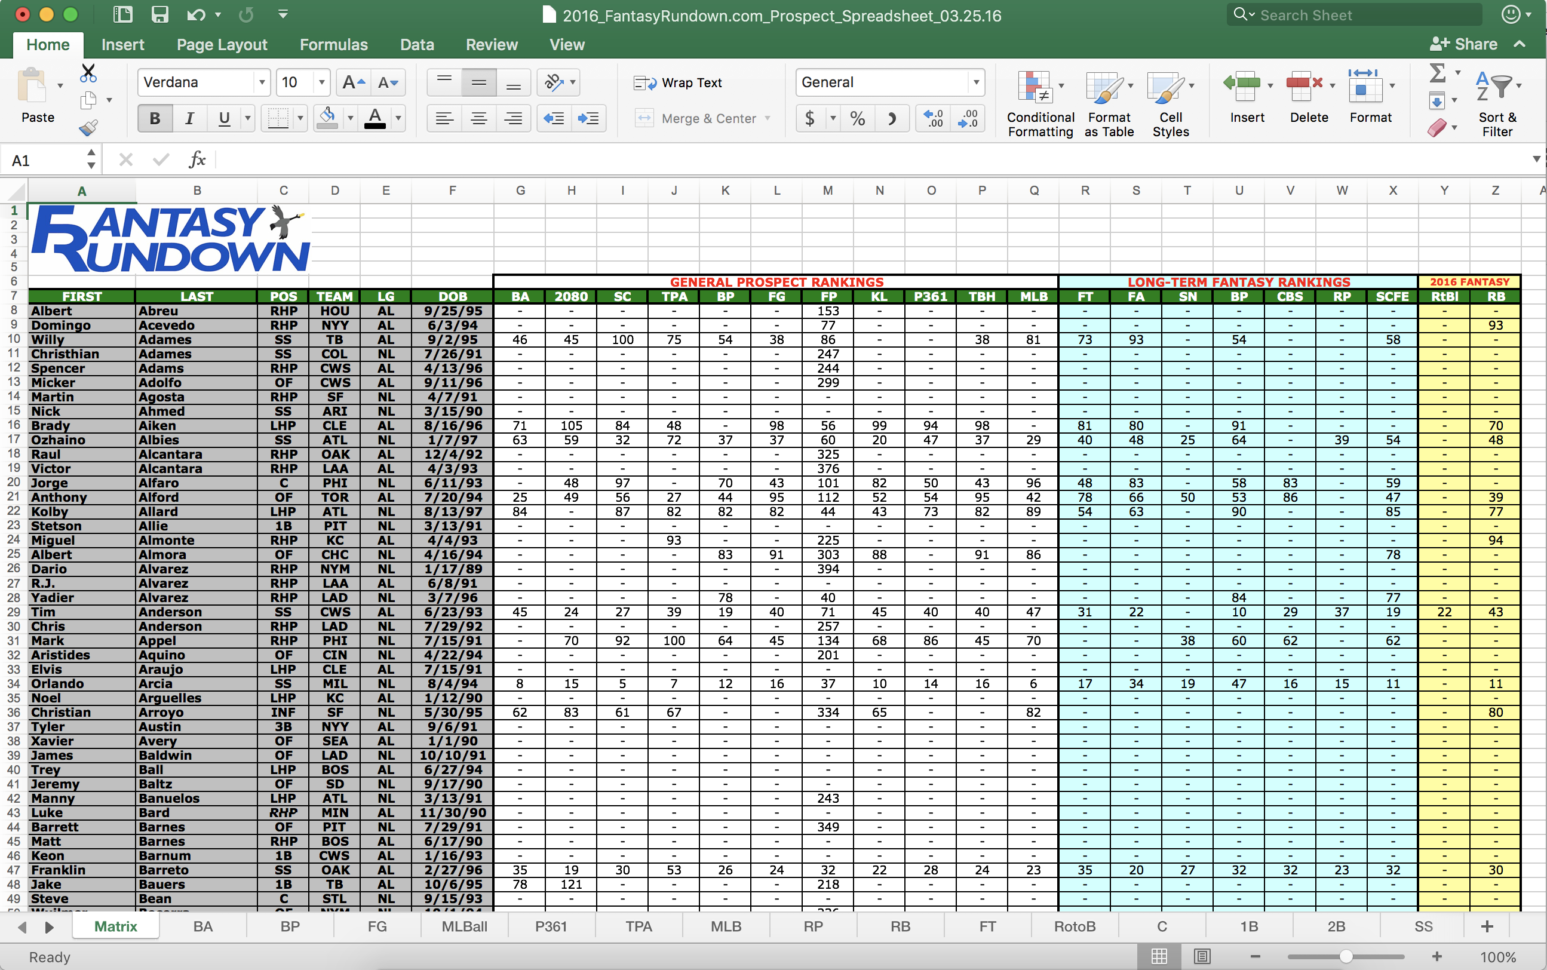 2018 Mlb Schedule Spreadsheet In Z2018 Mlb Prospect Spreadsheet  Fantasyrundown